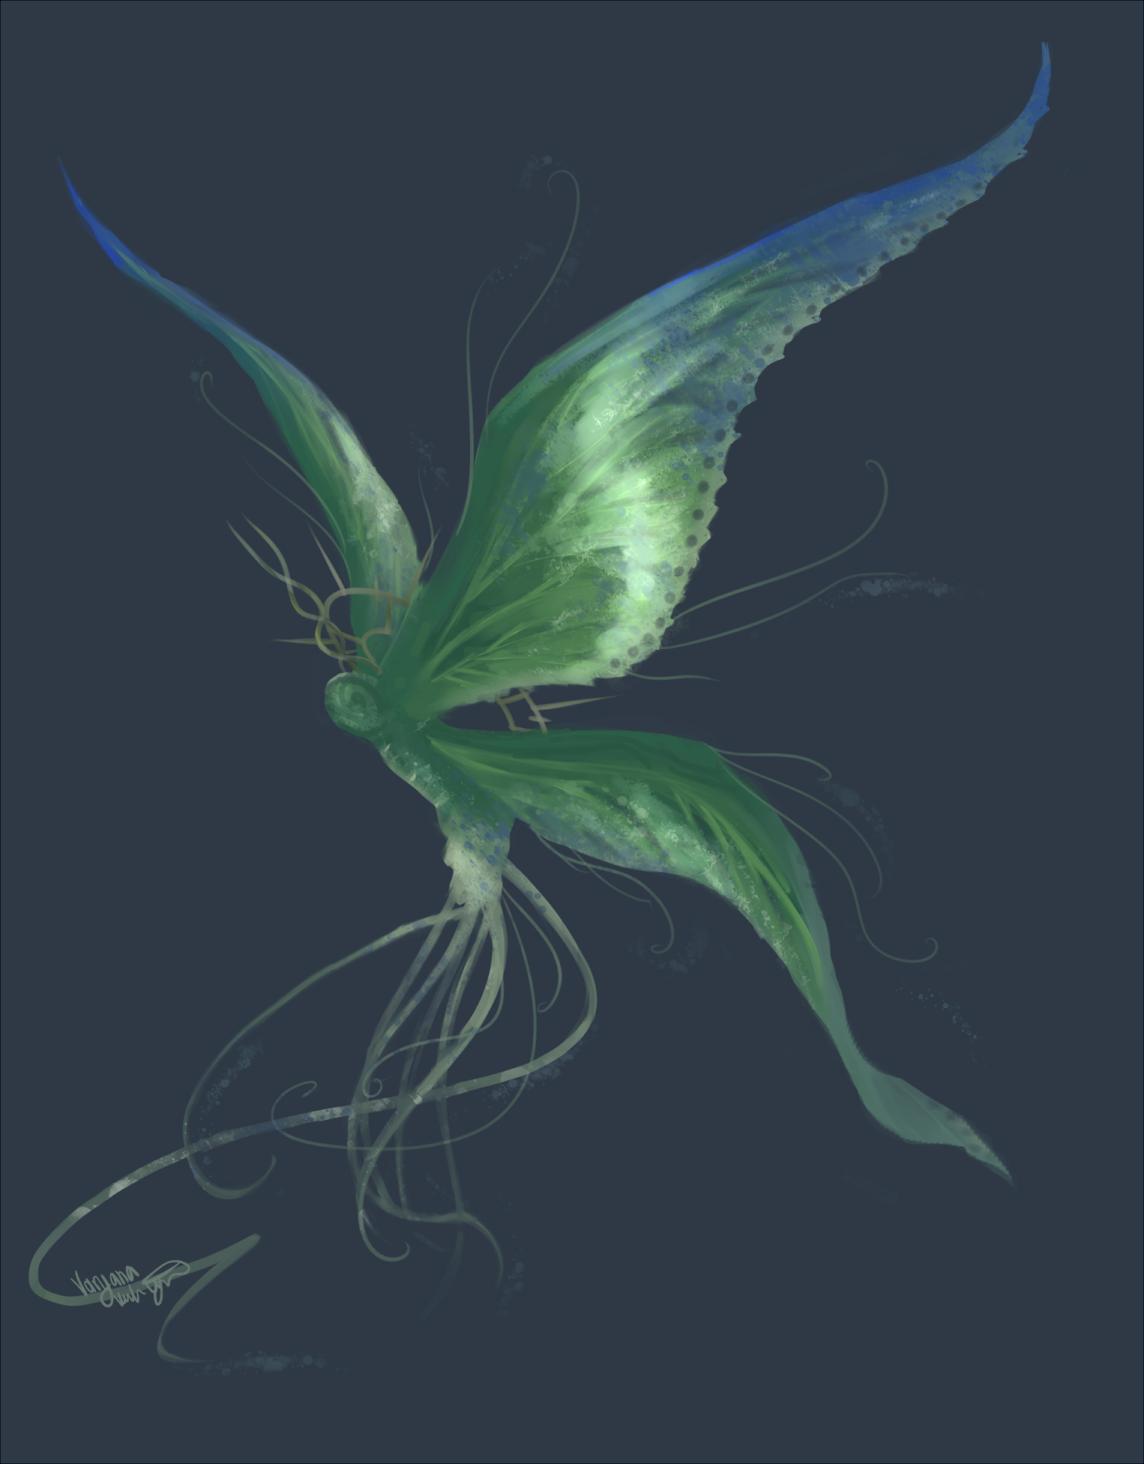 Moonlight_butterfly